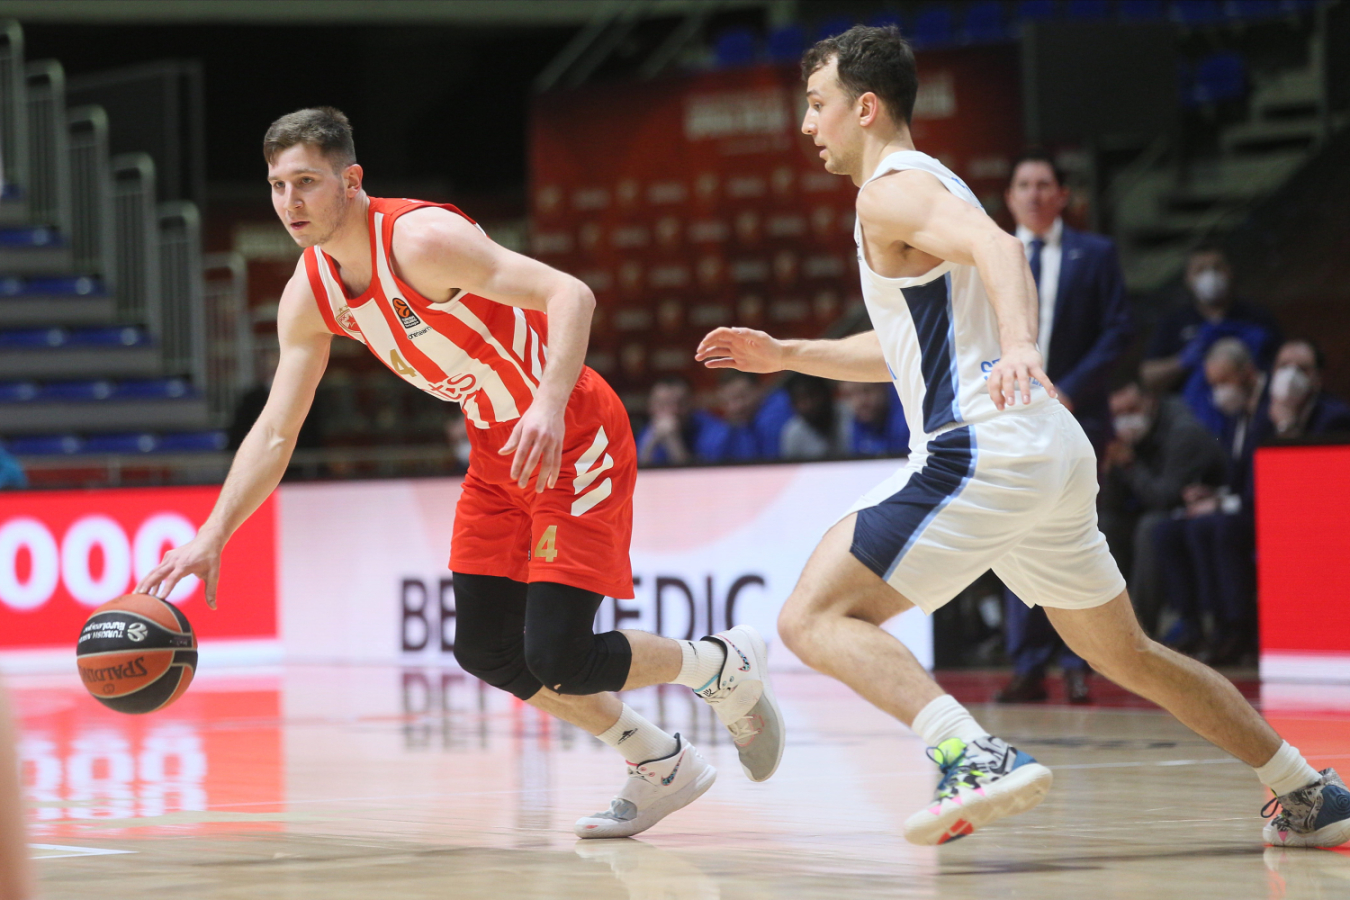 Evroliga: Košarkaši Crvene zvezde izgubili od Zenita u Beogradu (75:76)